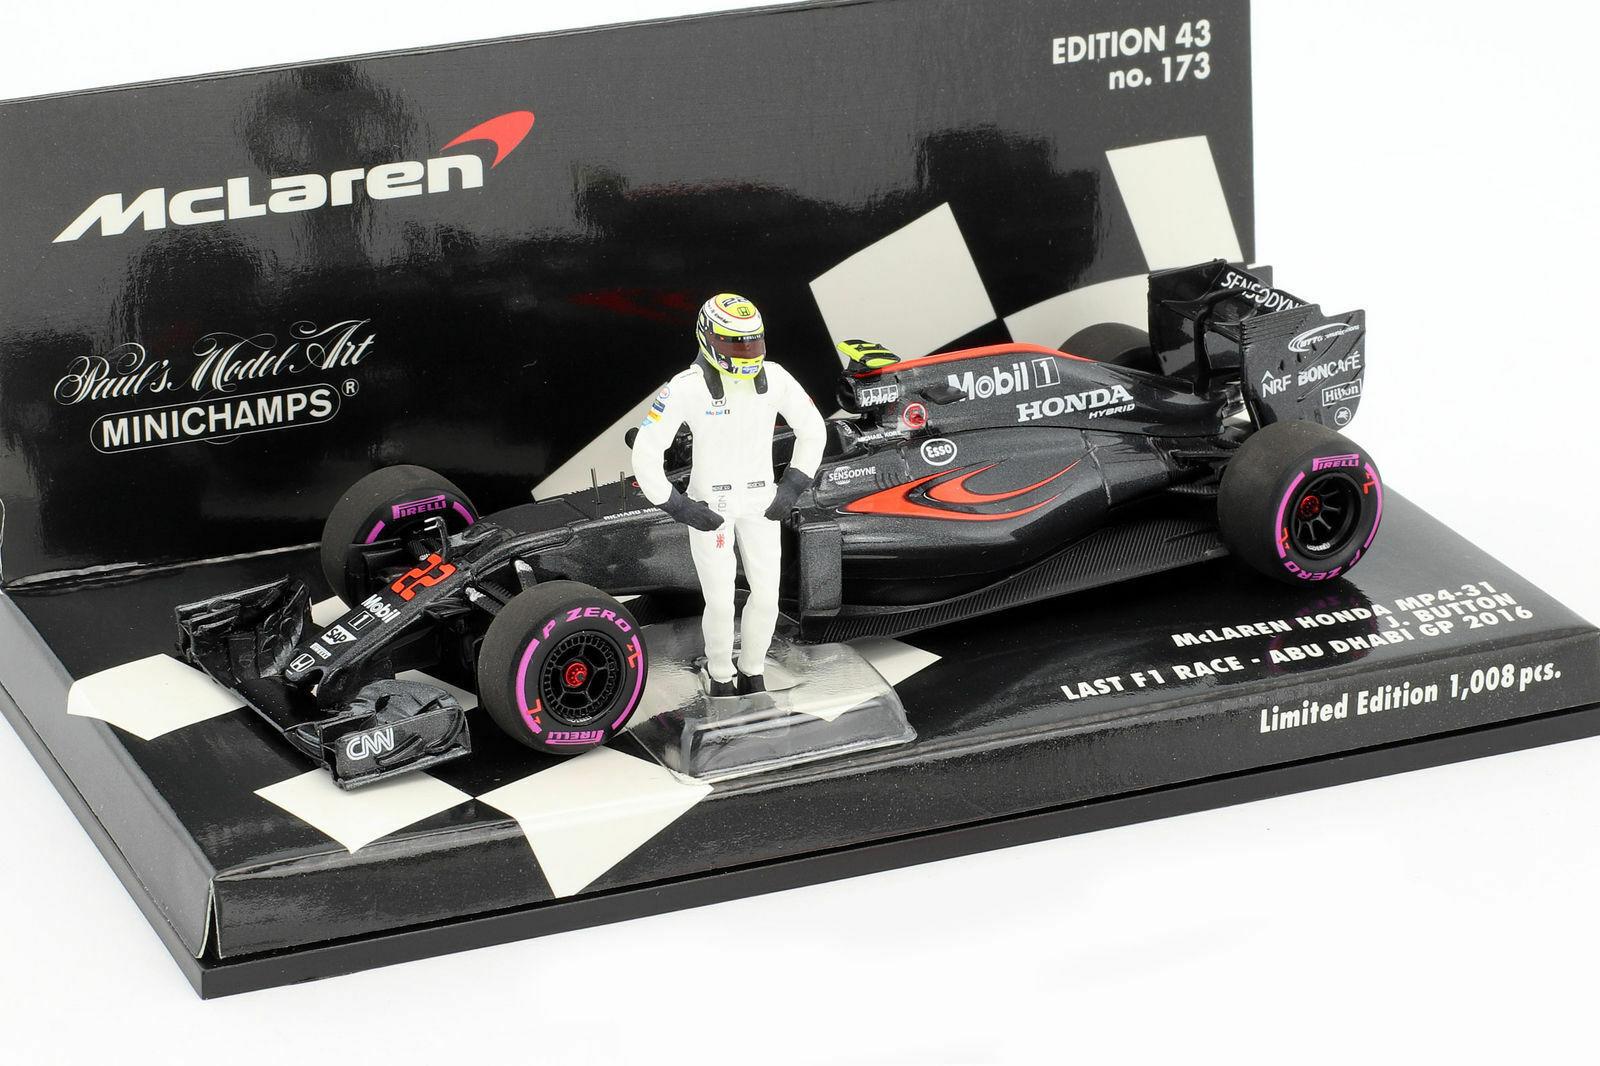 Minichamps F1 1 43rd McLaren Honda MP4-31 - J. BUTTON - Abu Dhabi GP 2016 - L.Ed